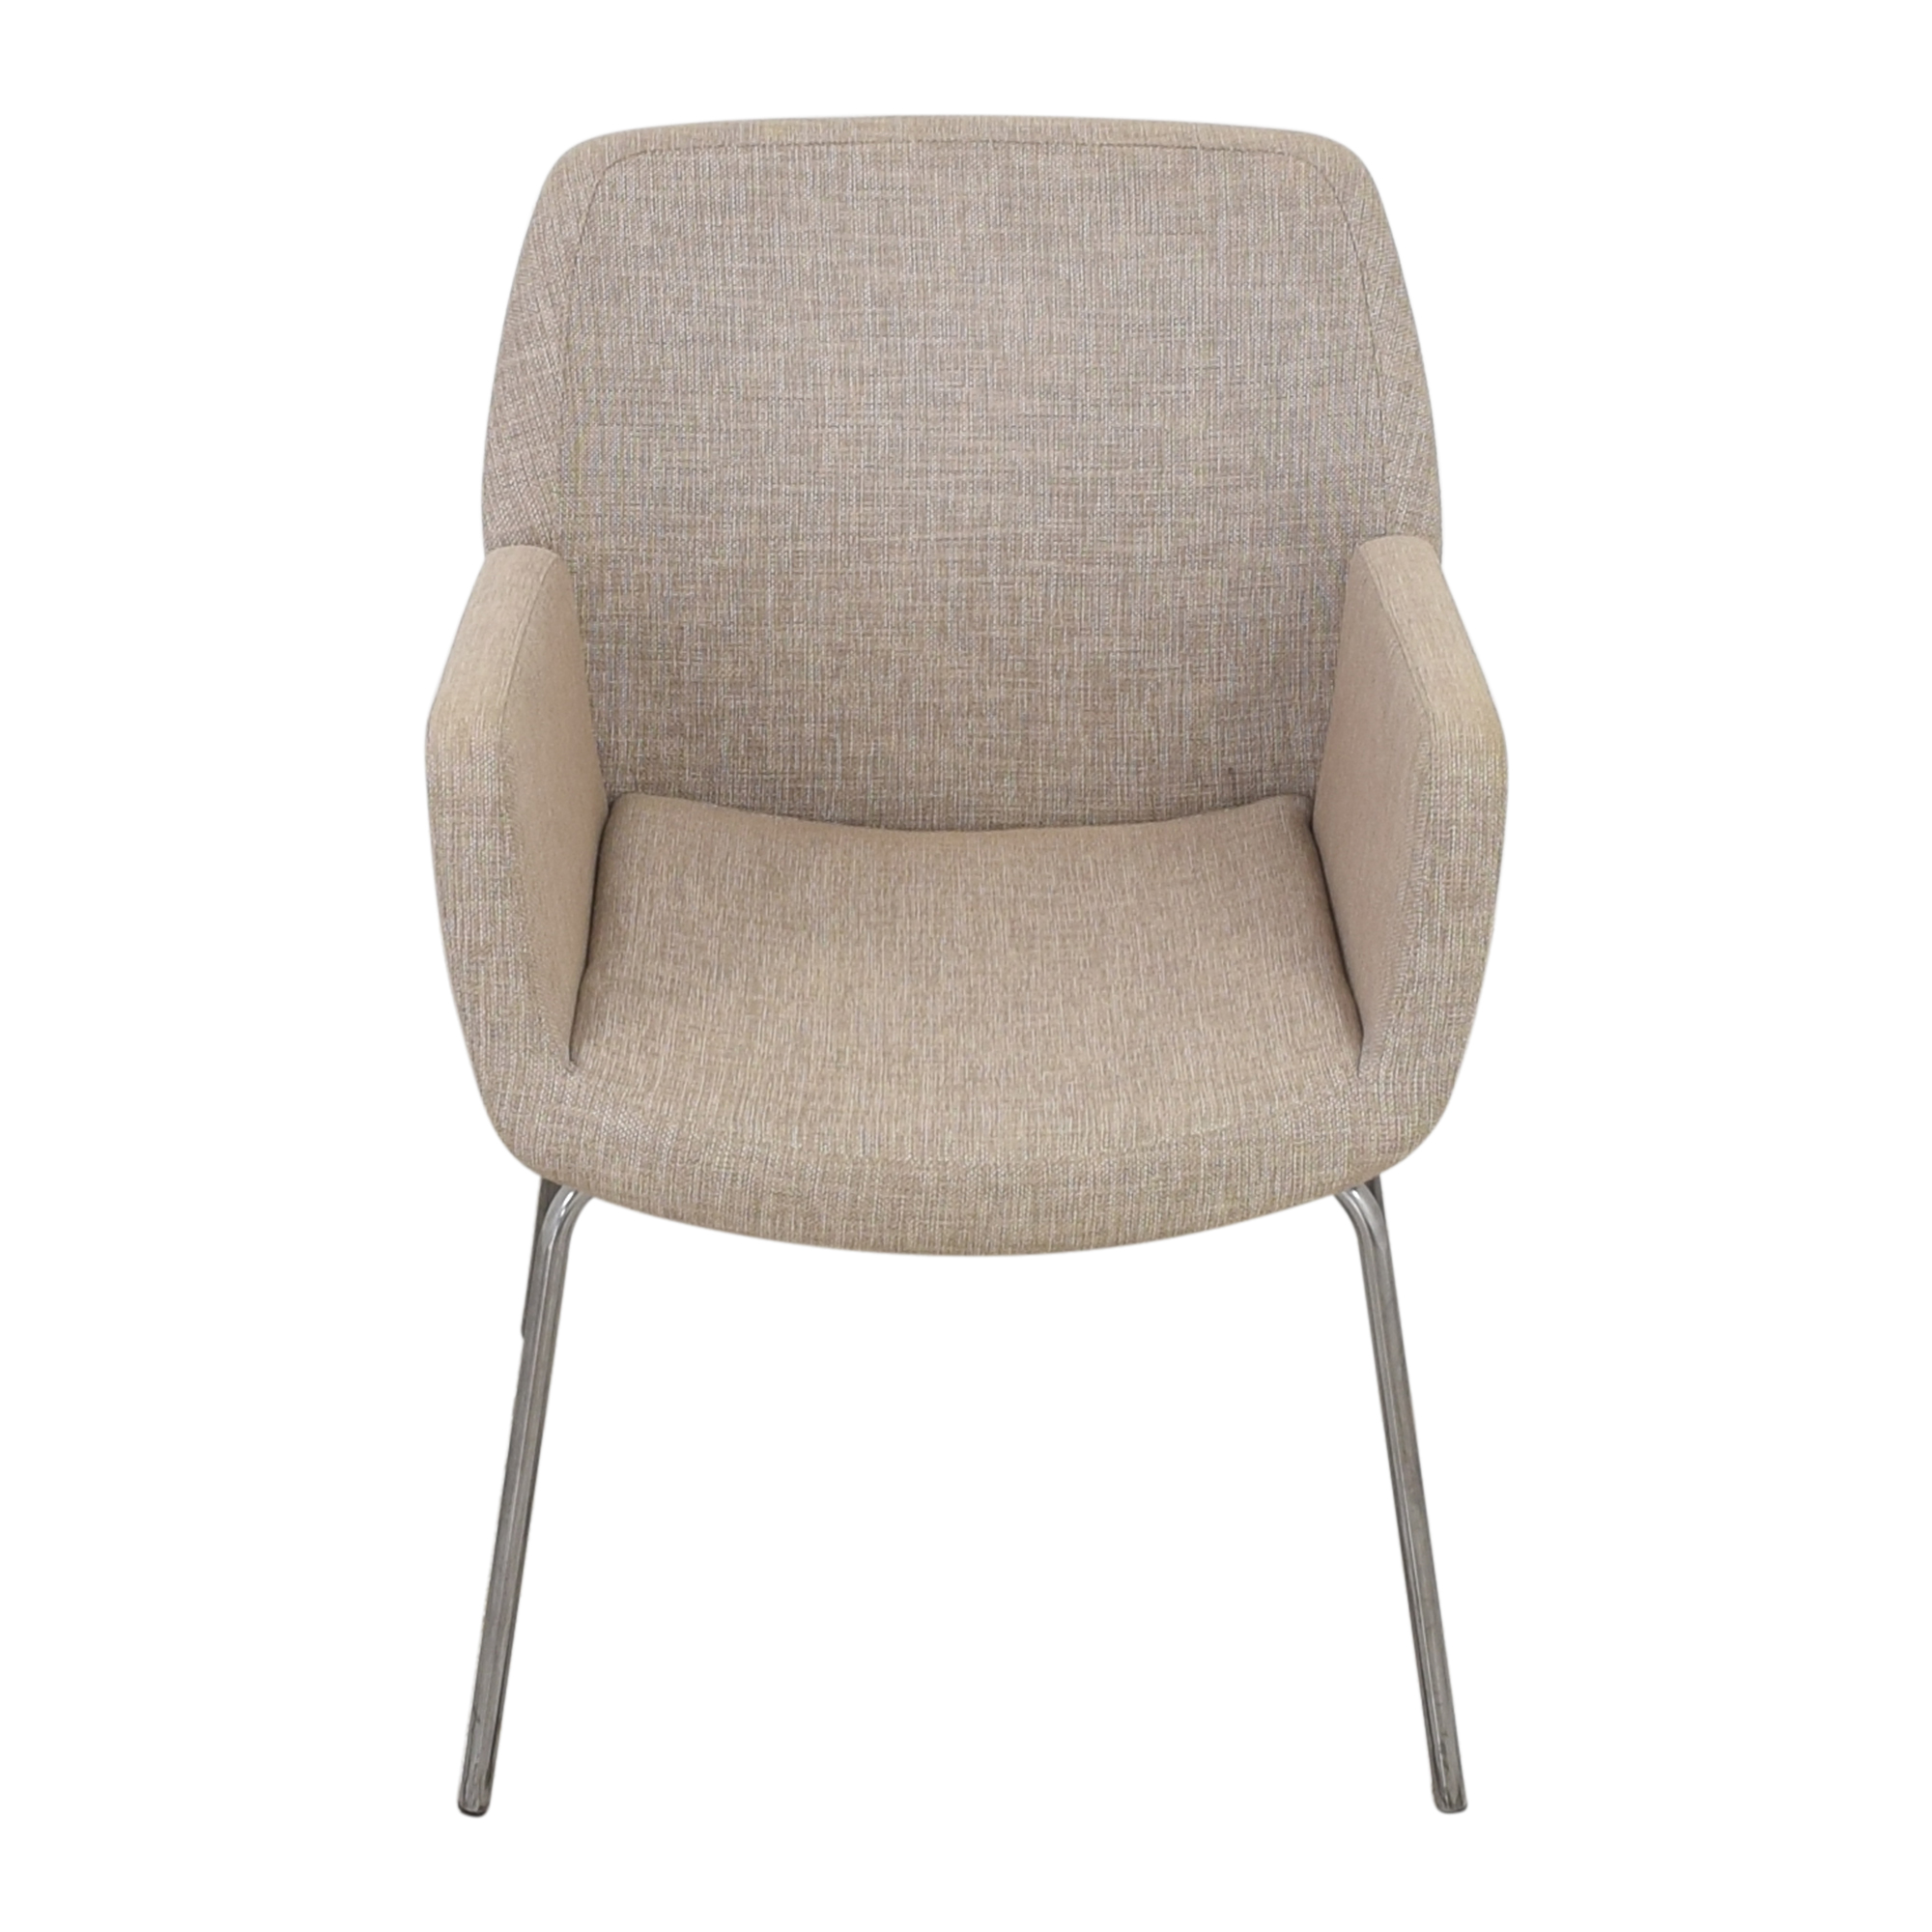 Steelcase Steelcase Coalesse Bindu Side Chair on sale